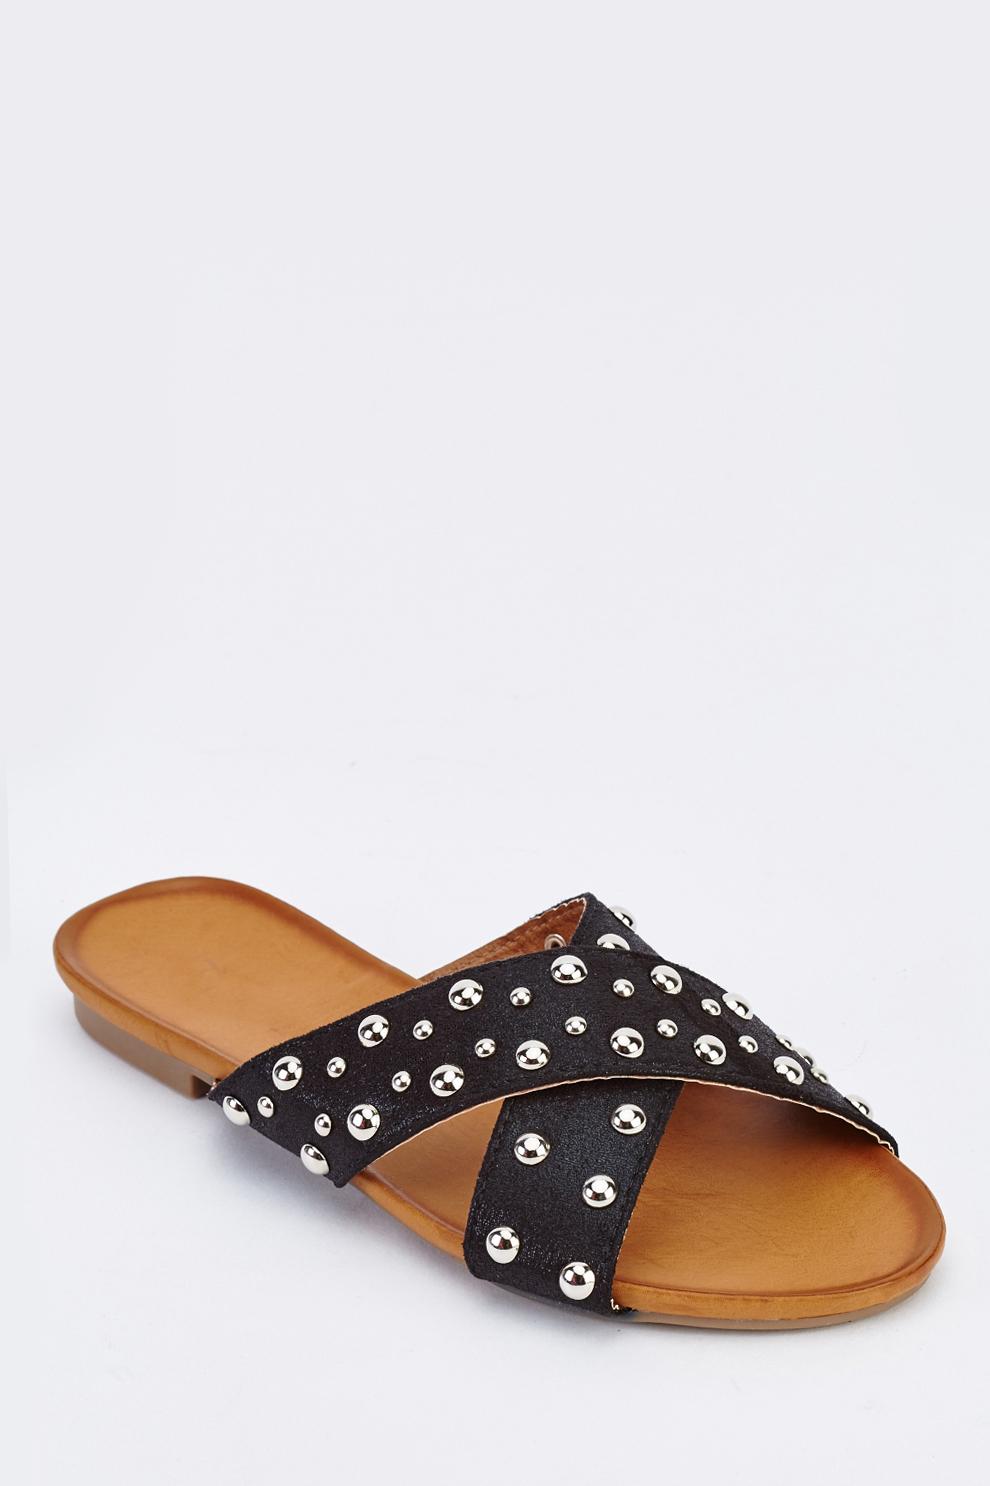 271923c4f5d8 Studded Cross Strap Sliders - Black - Just £5